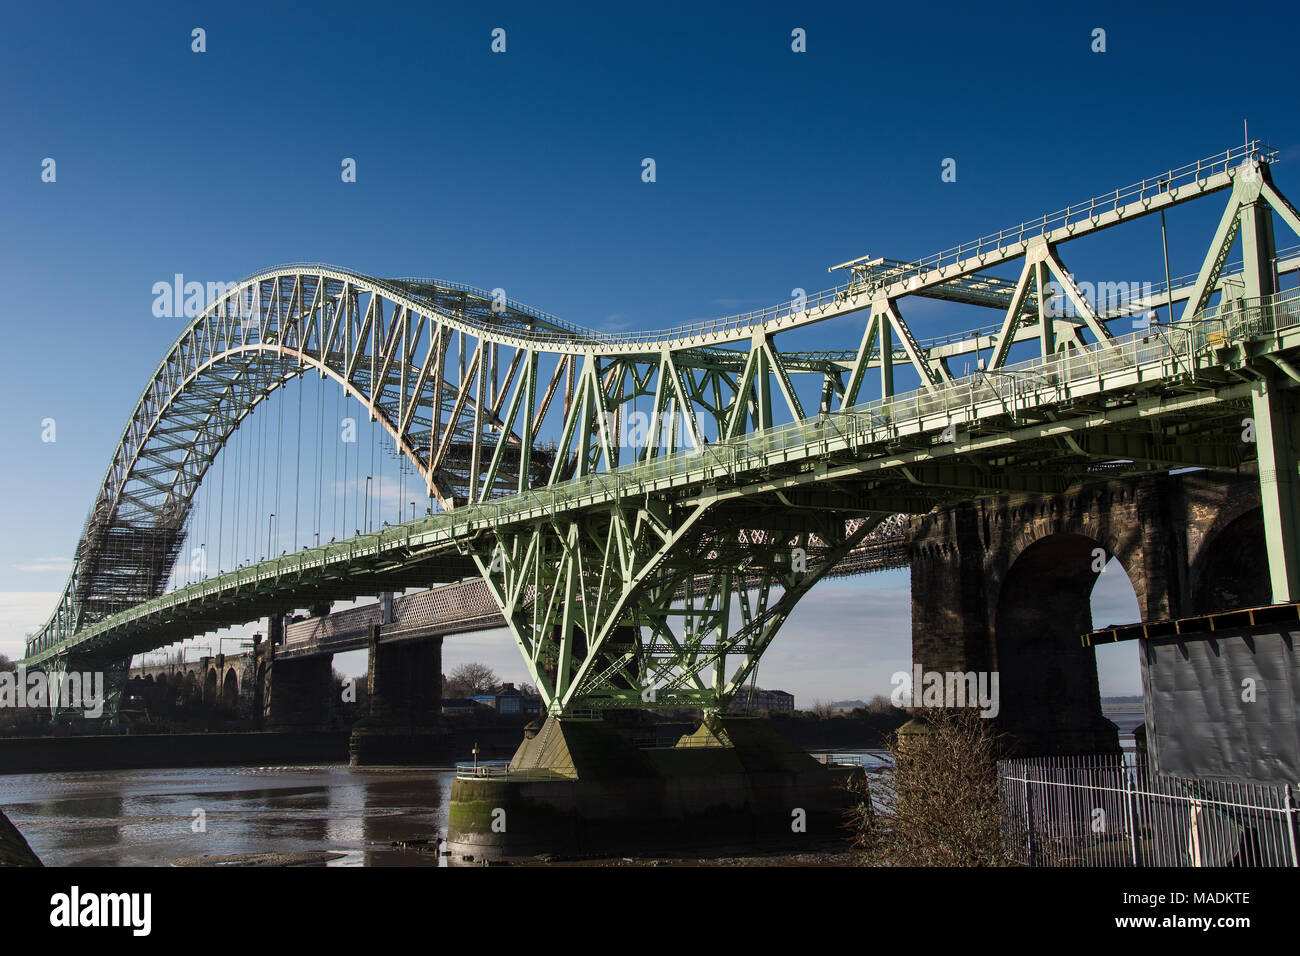 Runcorn old bridge over the river Mersey - Stock Image